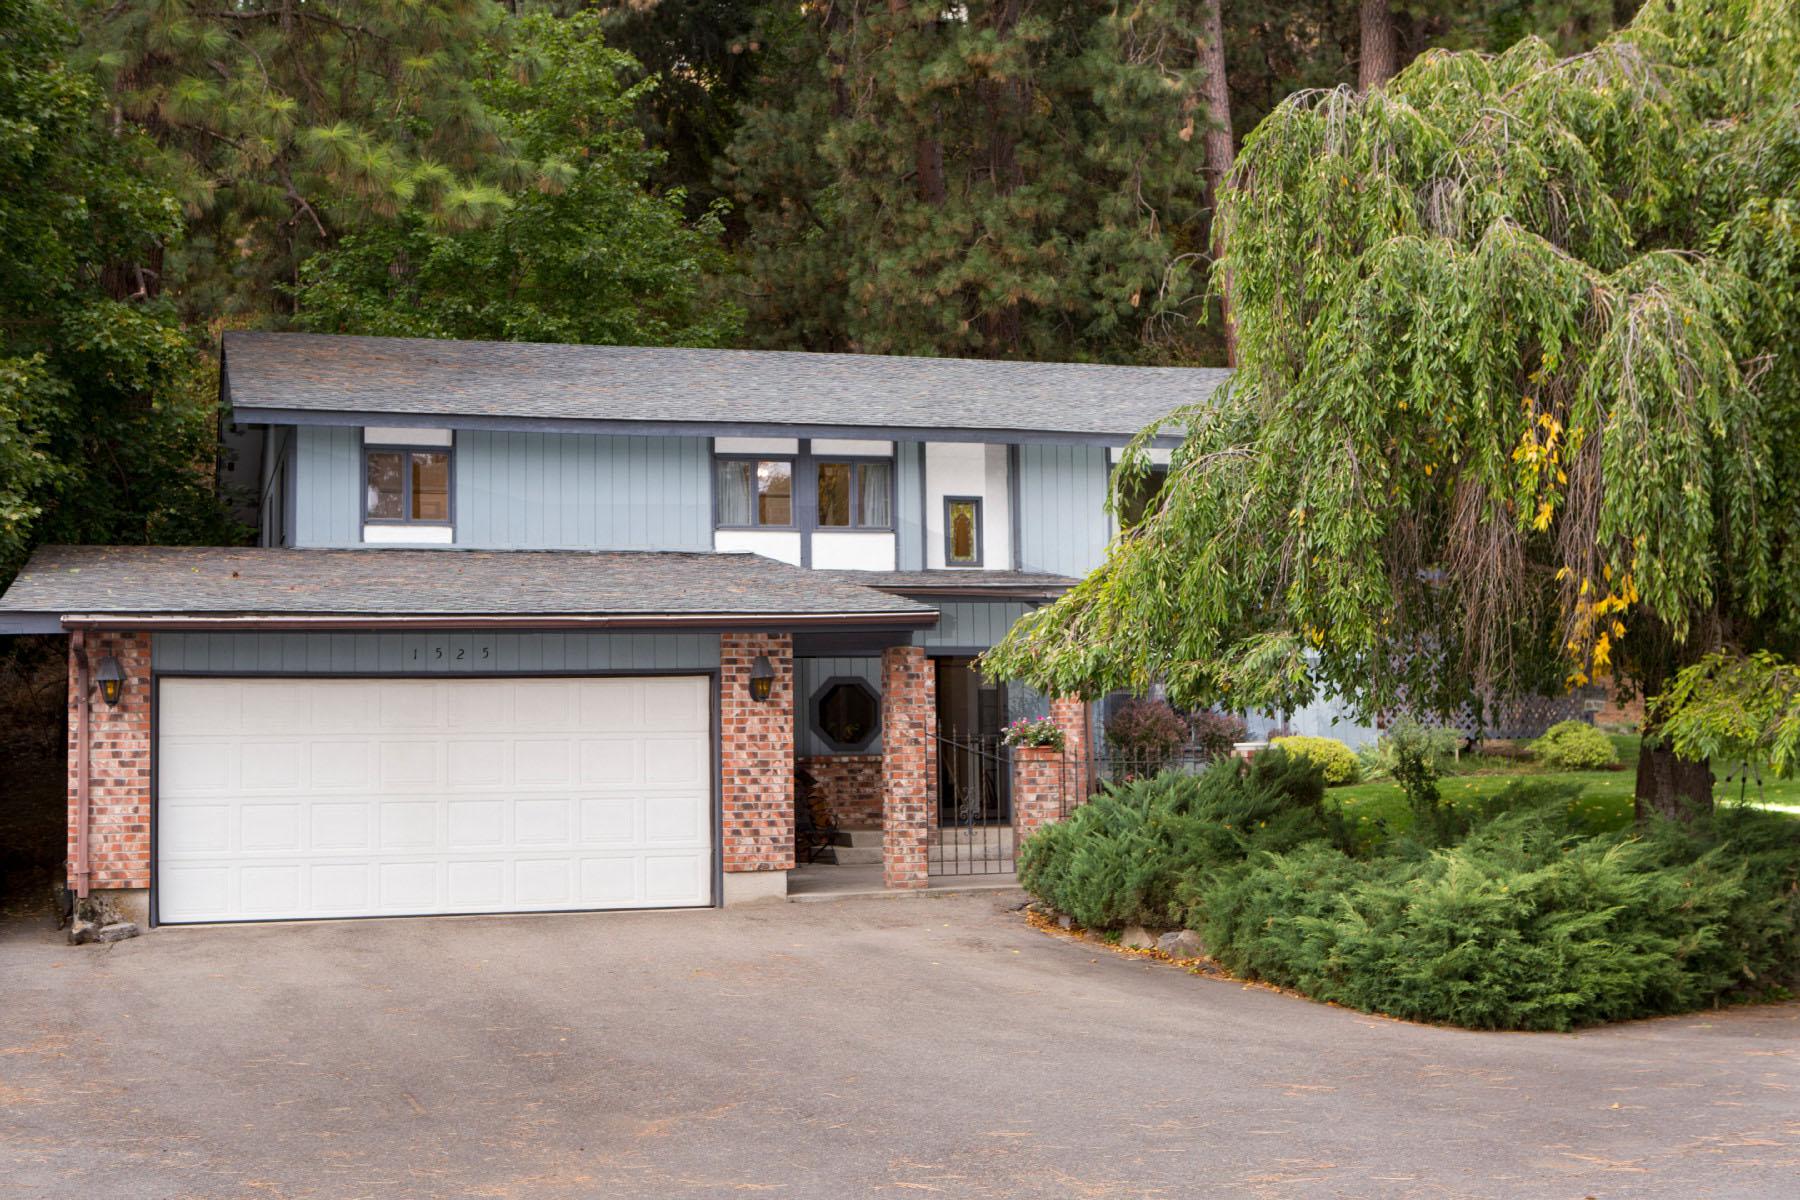 Single Family Home for Sale at Private & serene home in Dalton Gardens 1525 E Woodland Dr Dalton Gardens, Idaho 83815 United States